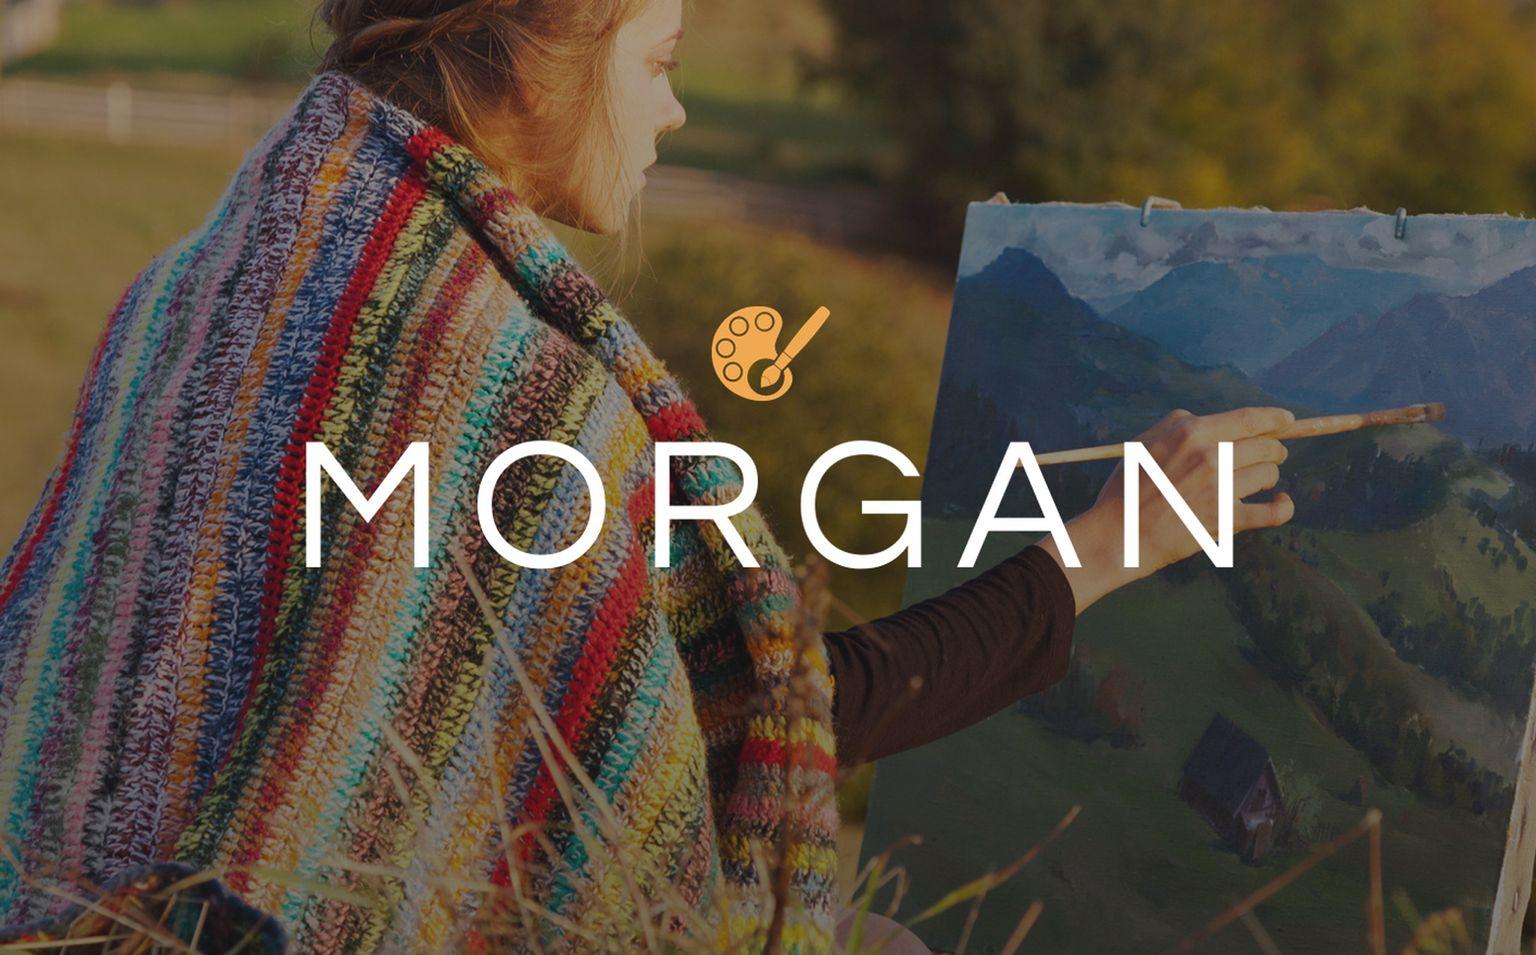 Morgan - Artist Portfolio Multipage HTML5 Website Template